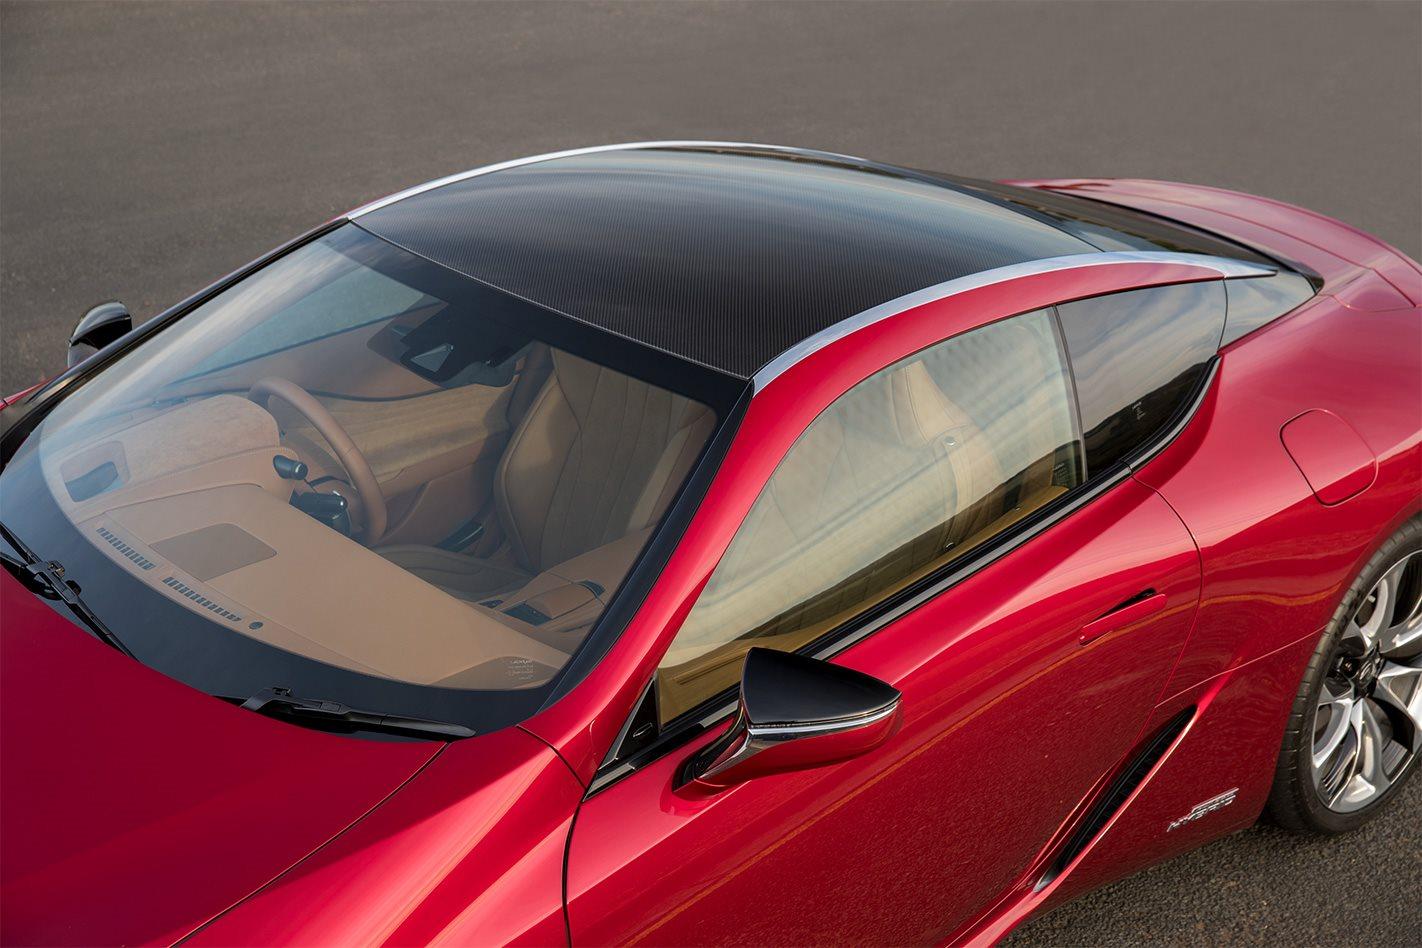 2018 Lexus LC 500 Hybrid roof